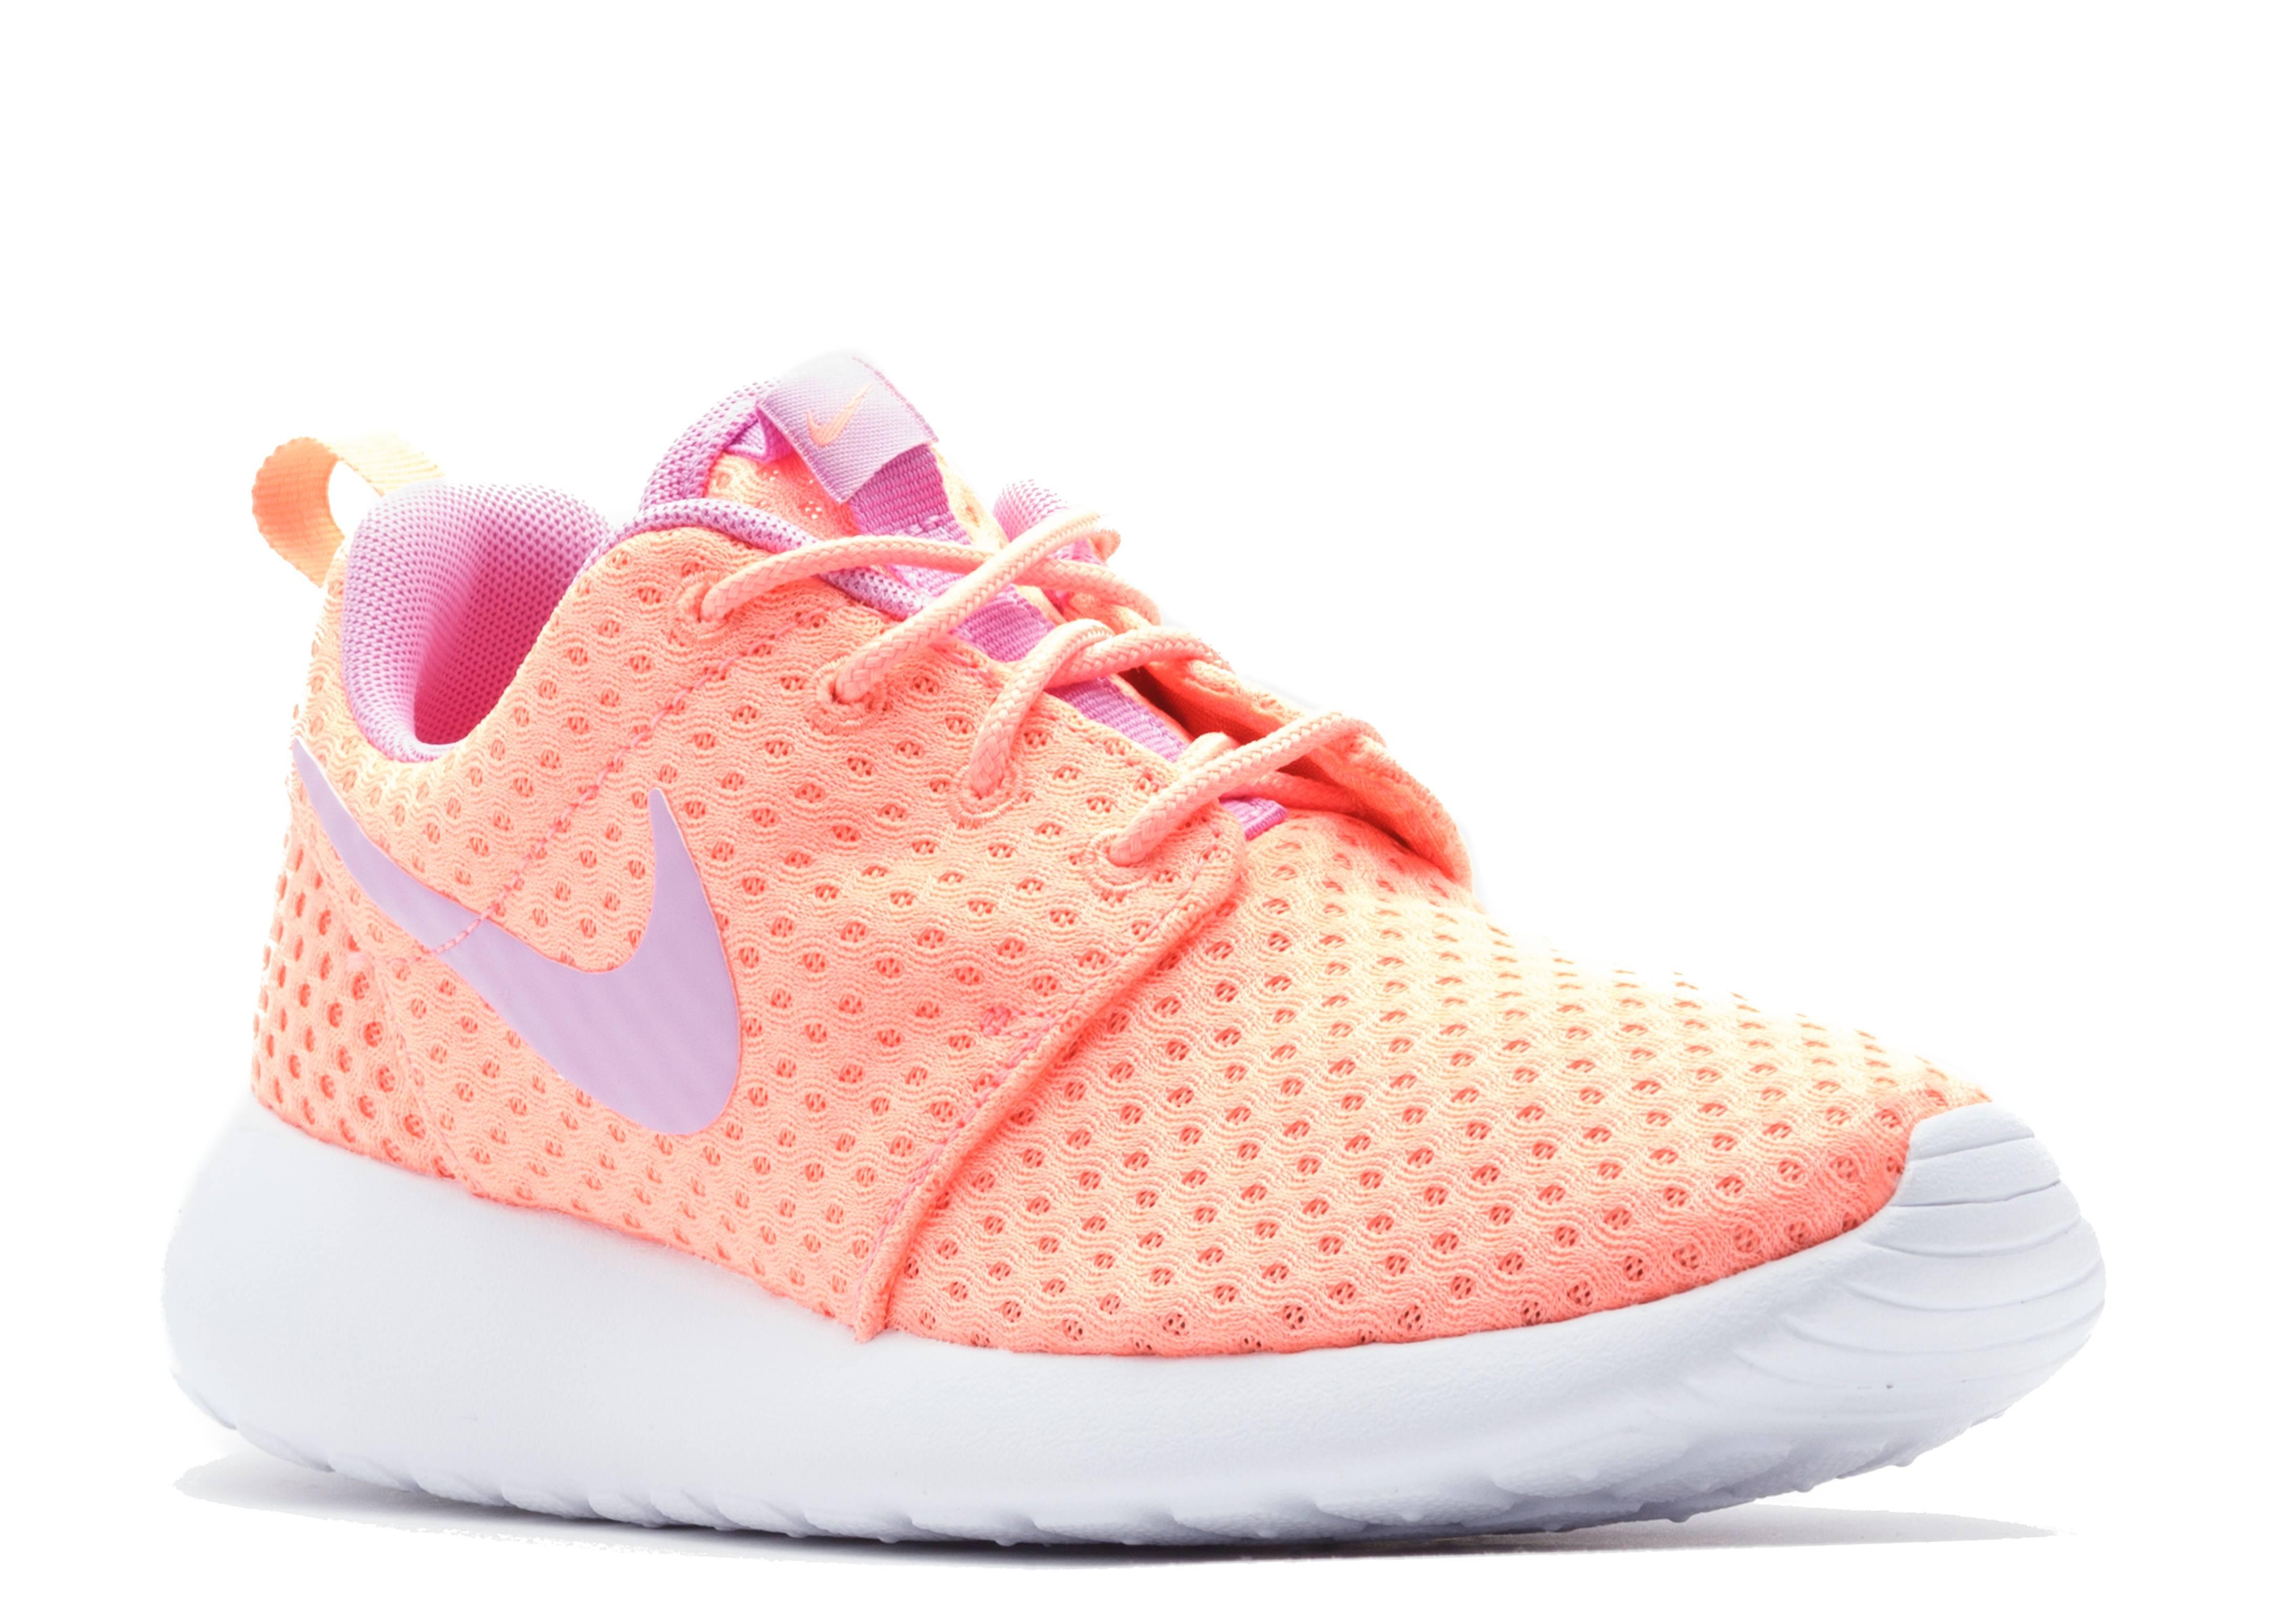 sports shoes 76366 1f4be W s Roshe One Br - Nike - 724850 661 - lava glow fuchsia glow-white    Flight Club